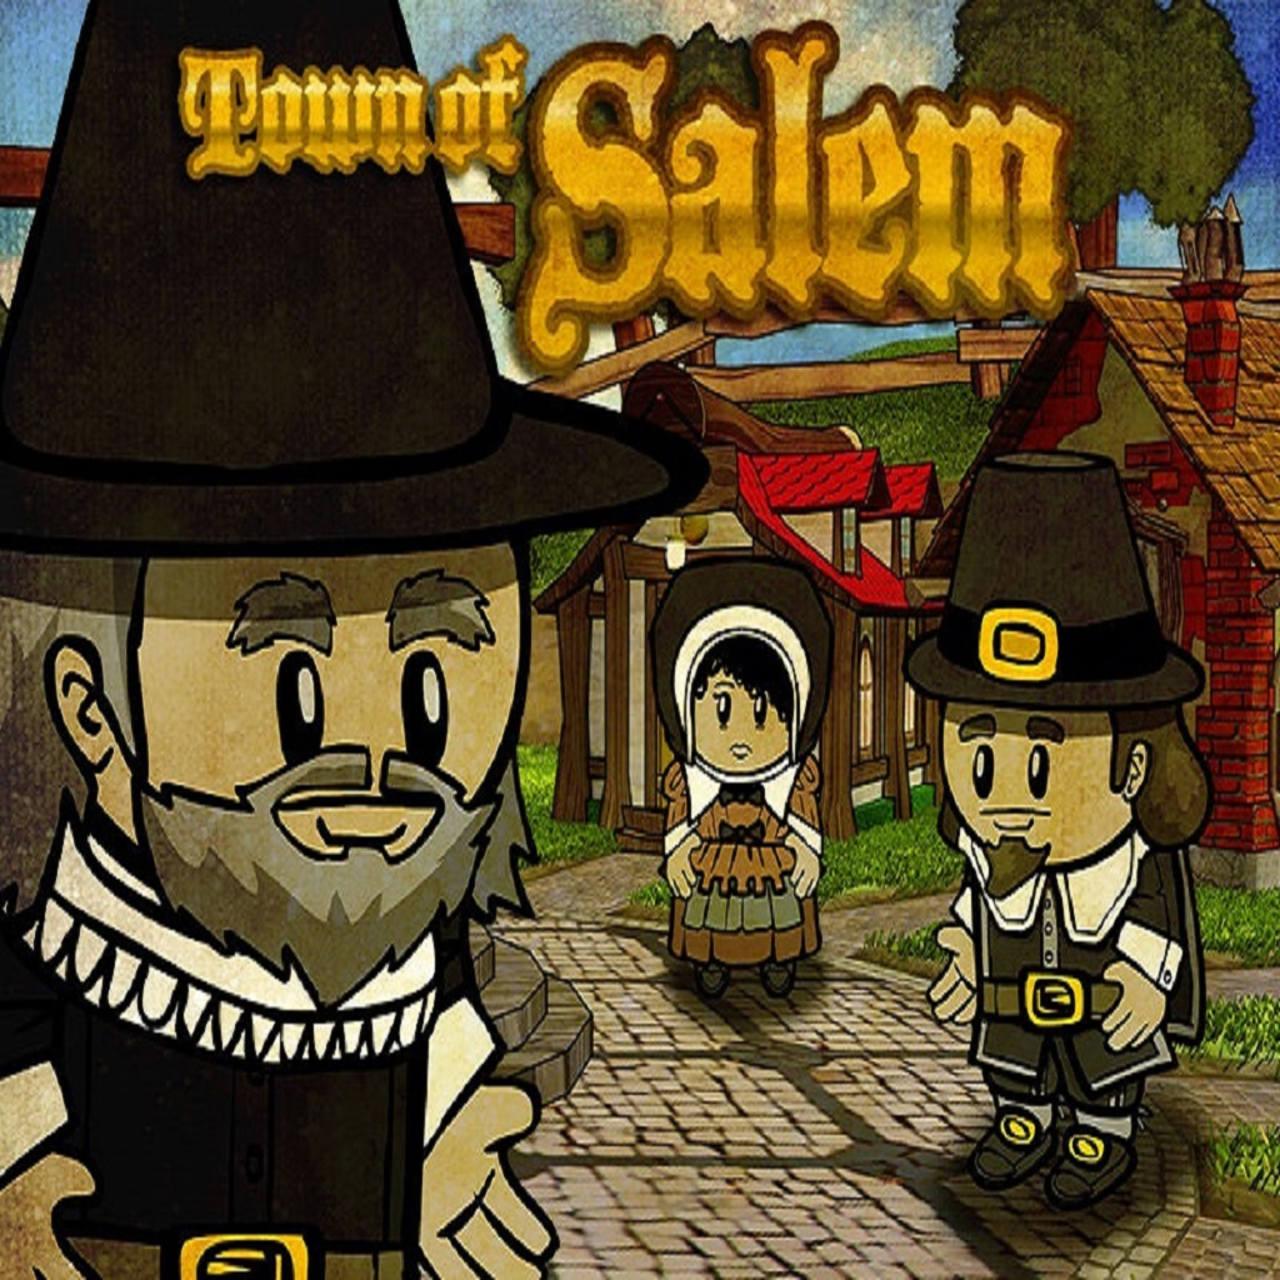 15 Games Like Town of Salem (September 2020) - LyncConf Games